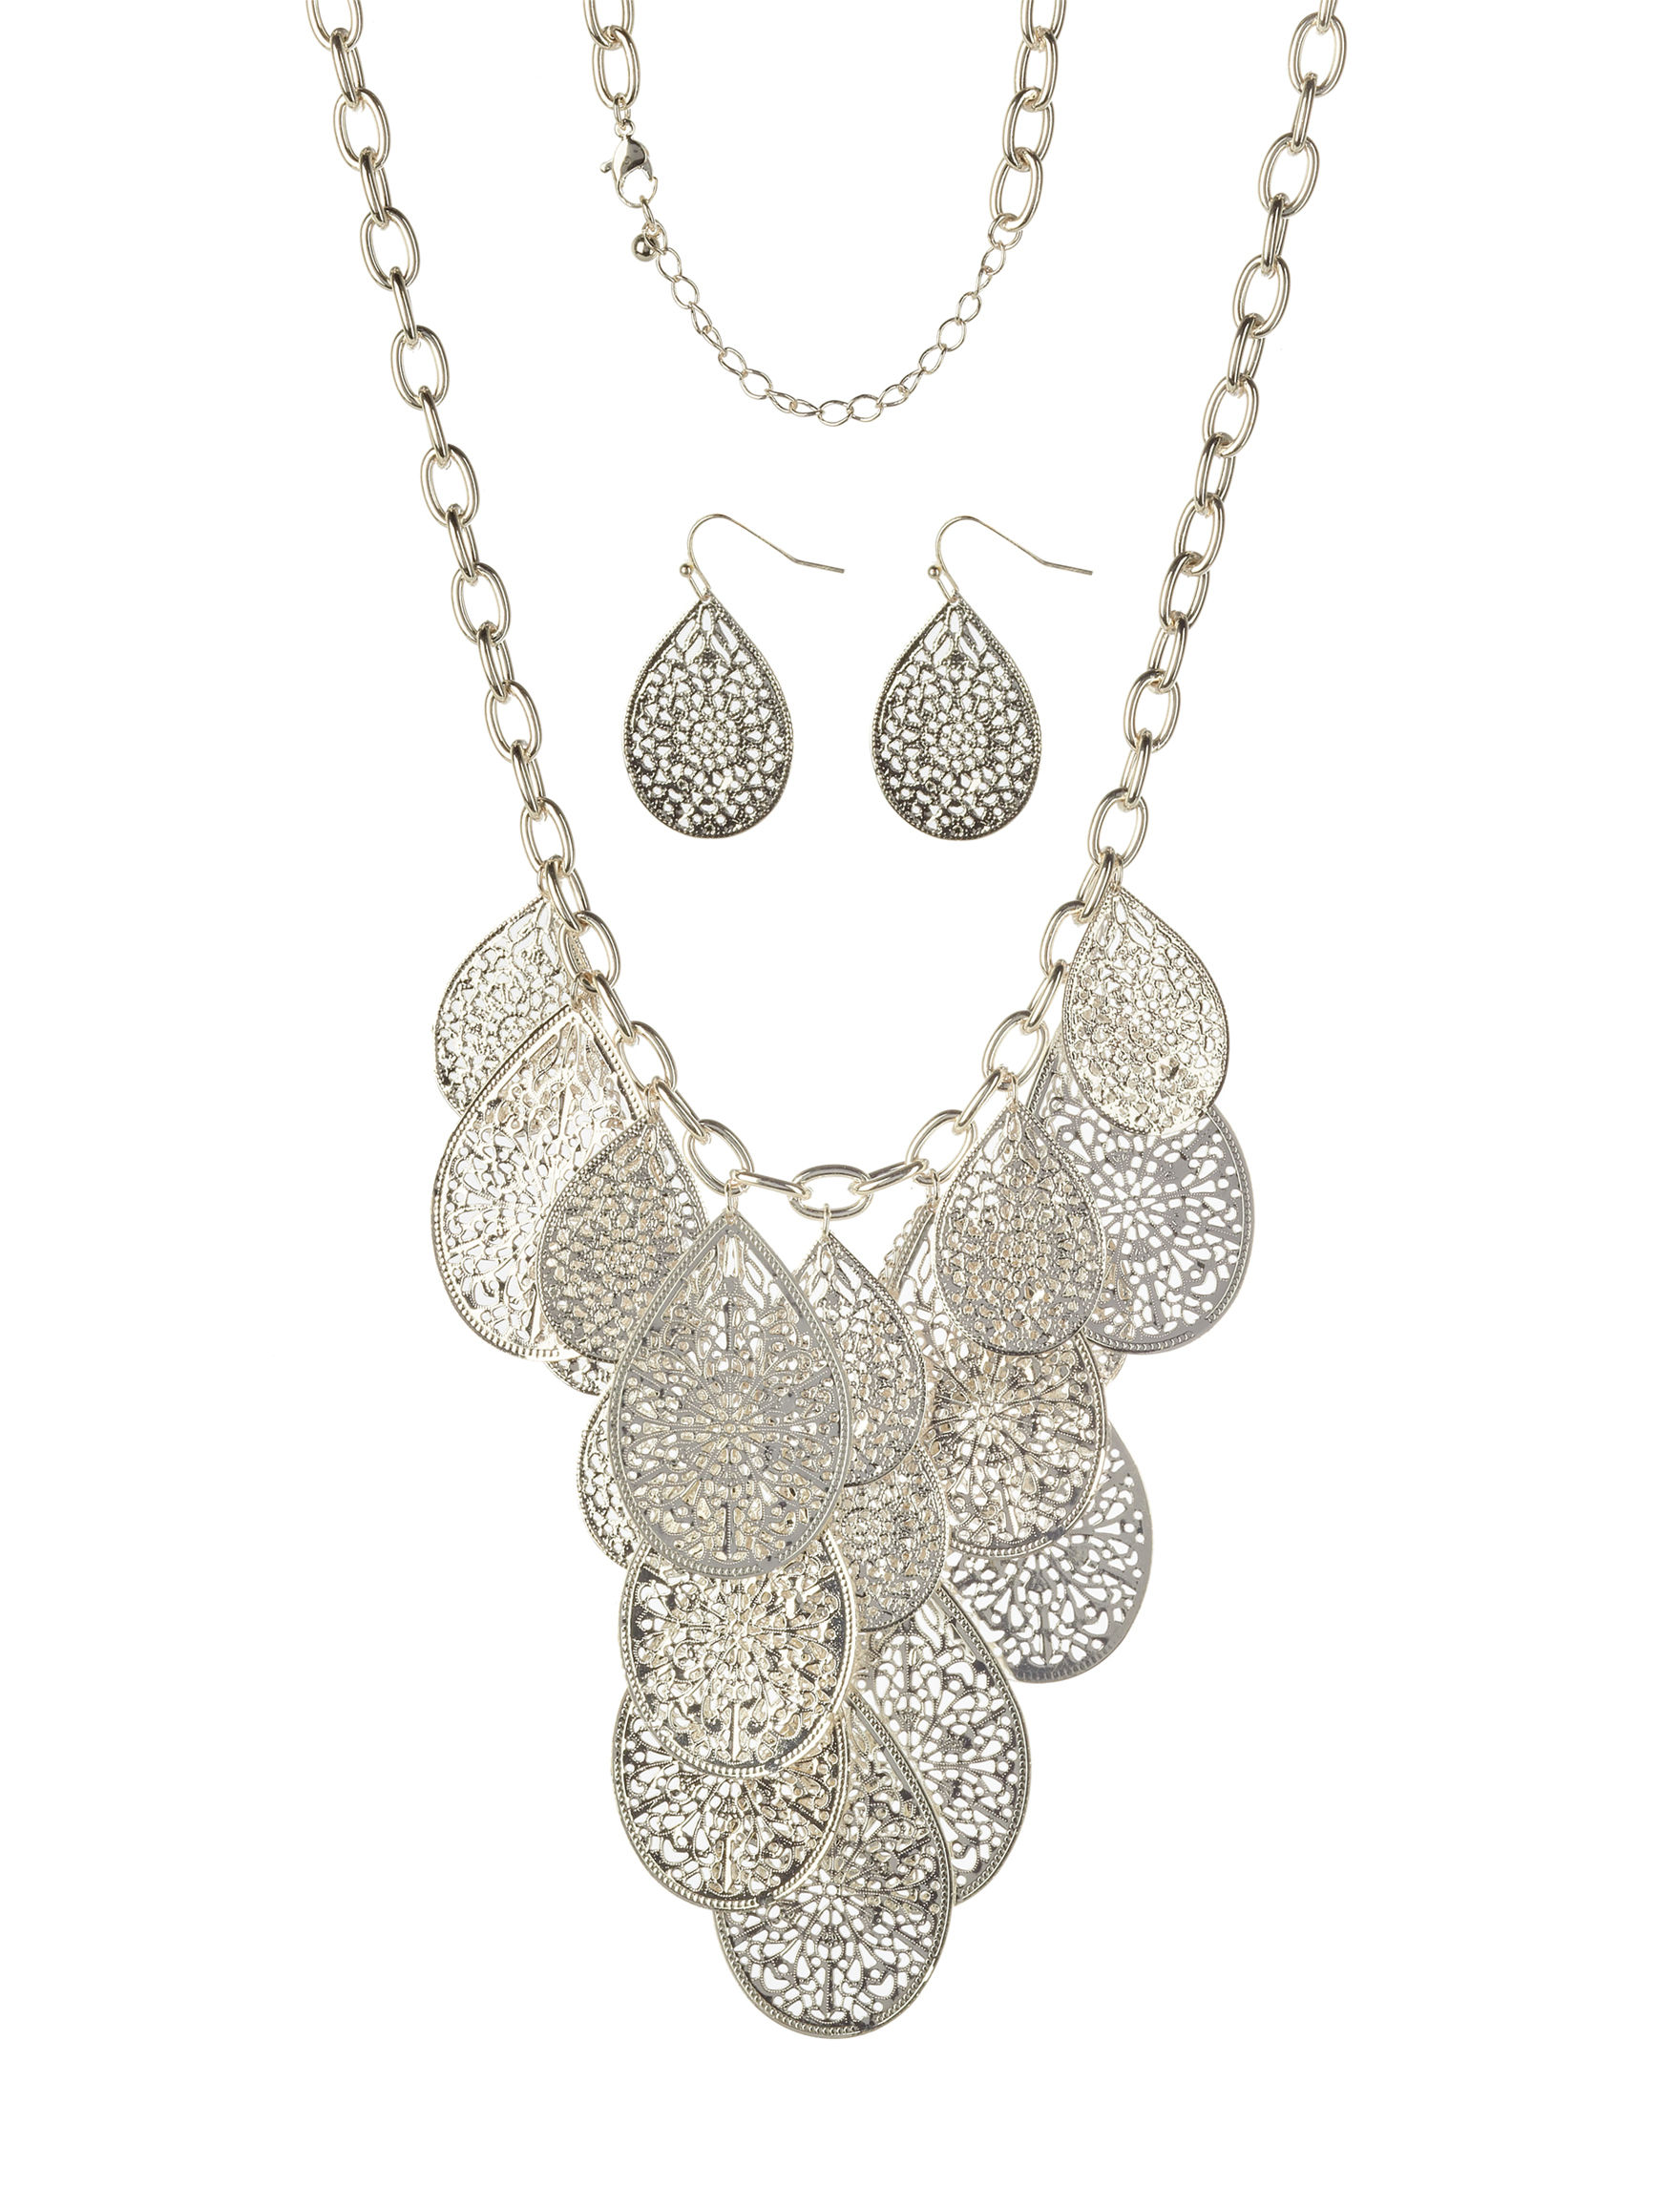 Hannah Silver Jewelry Sets Fashion Jewelry